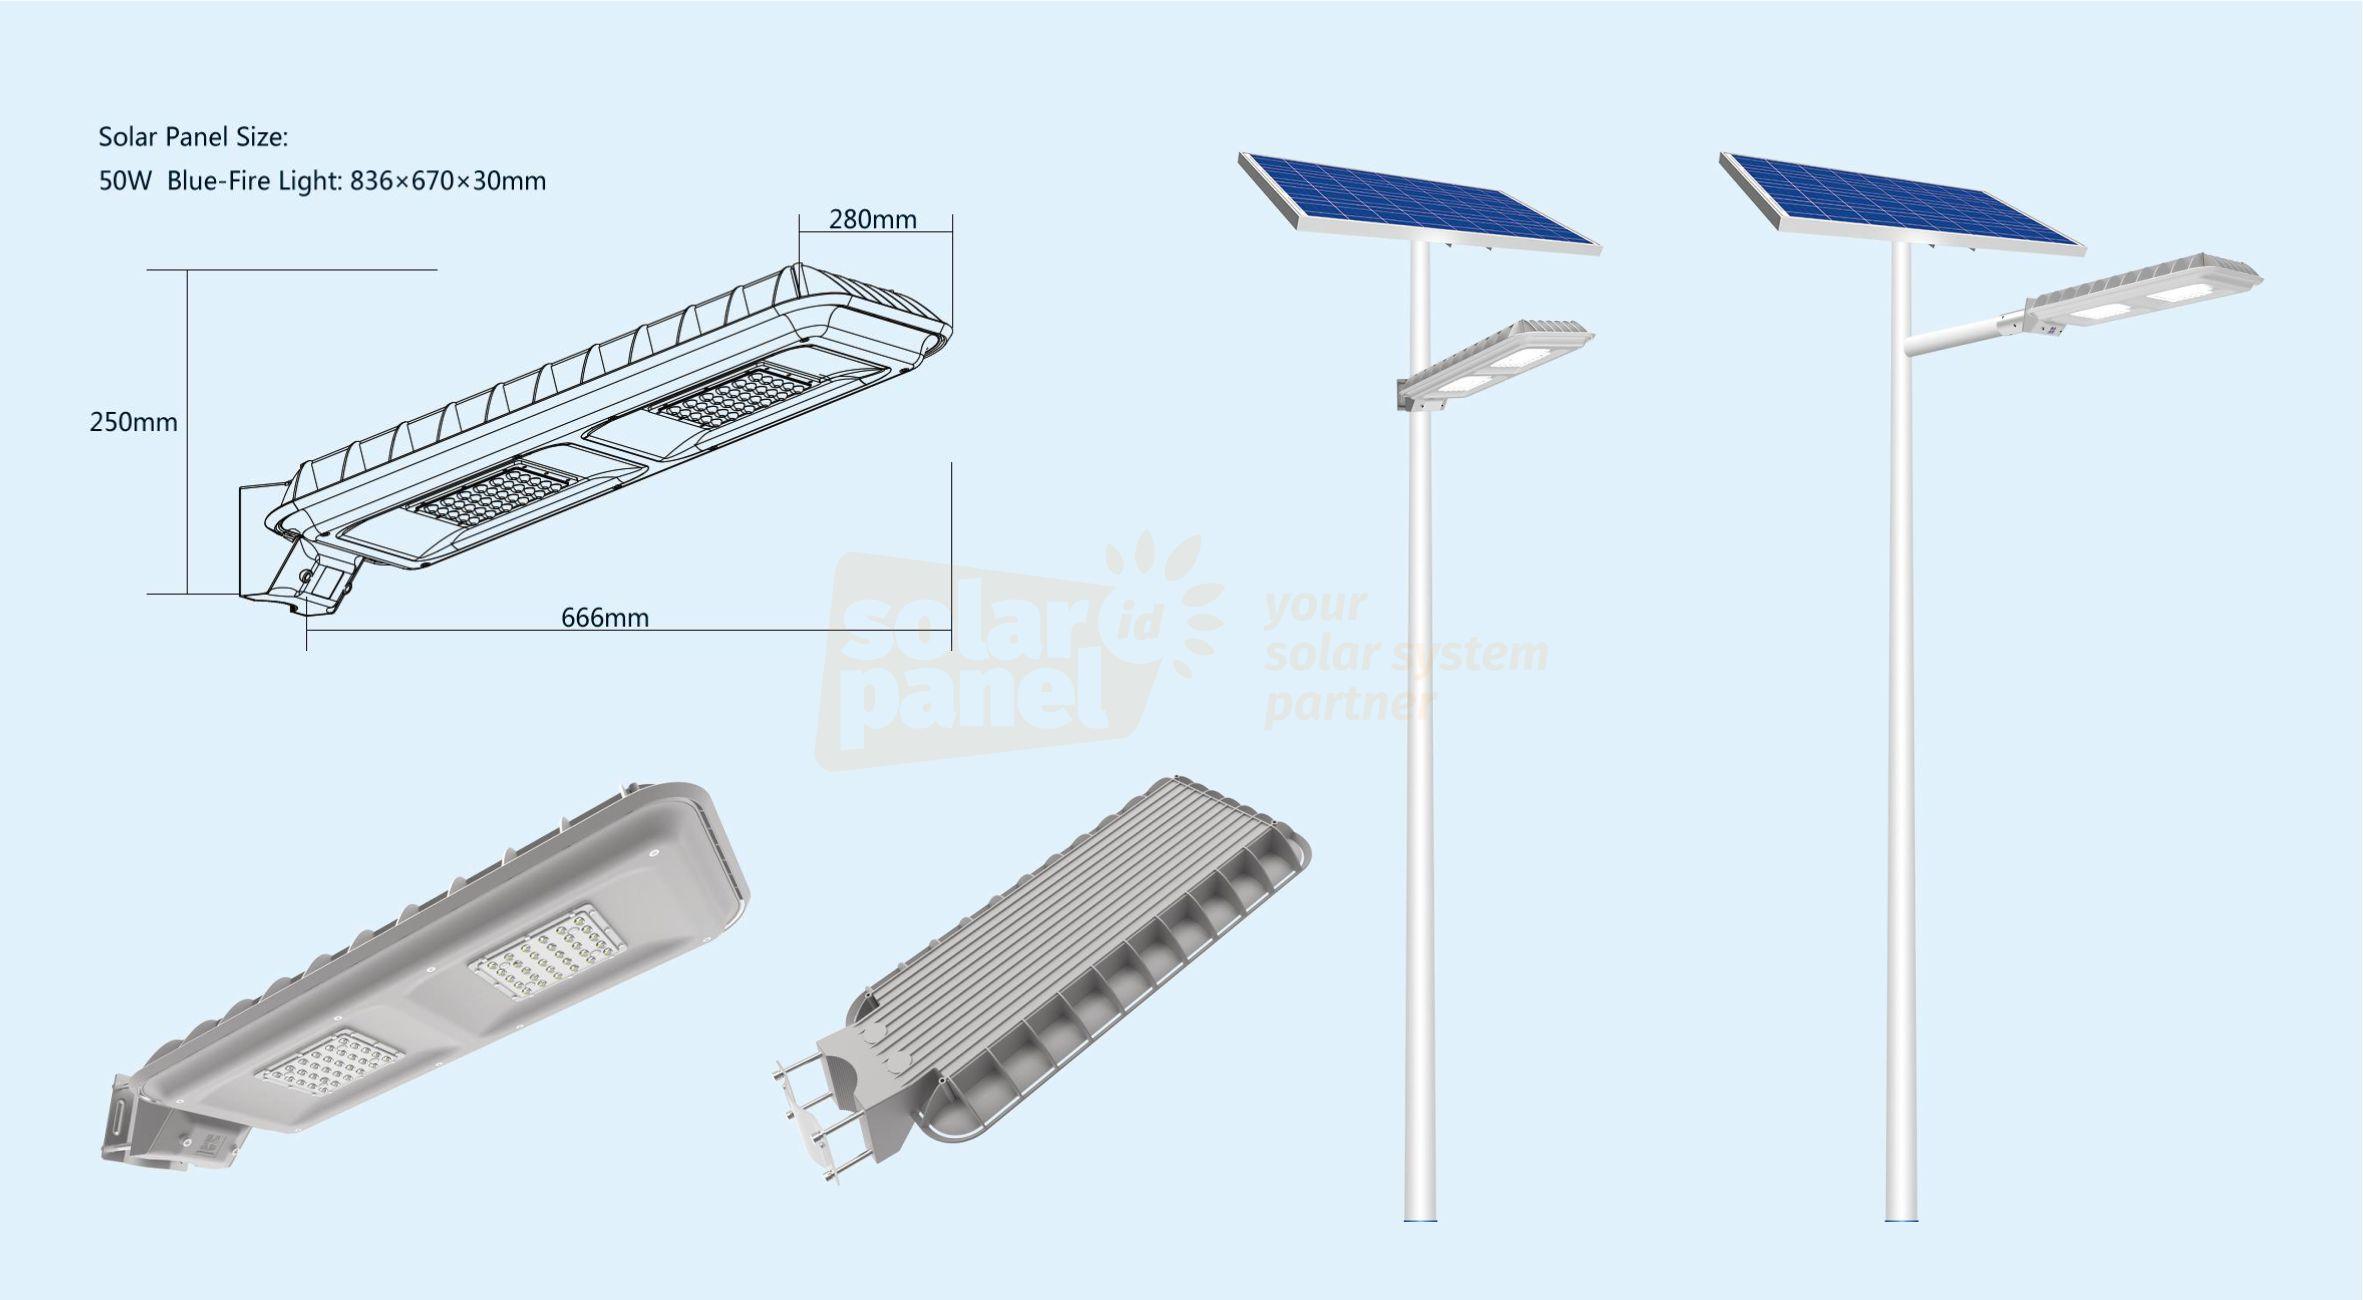 jual paket lampu pju 2in1 solarcell bluefire light 50 watt satu set